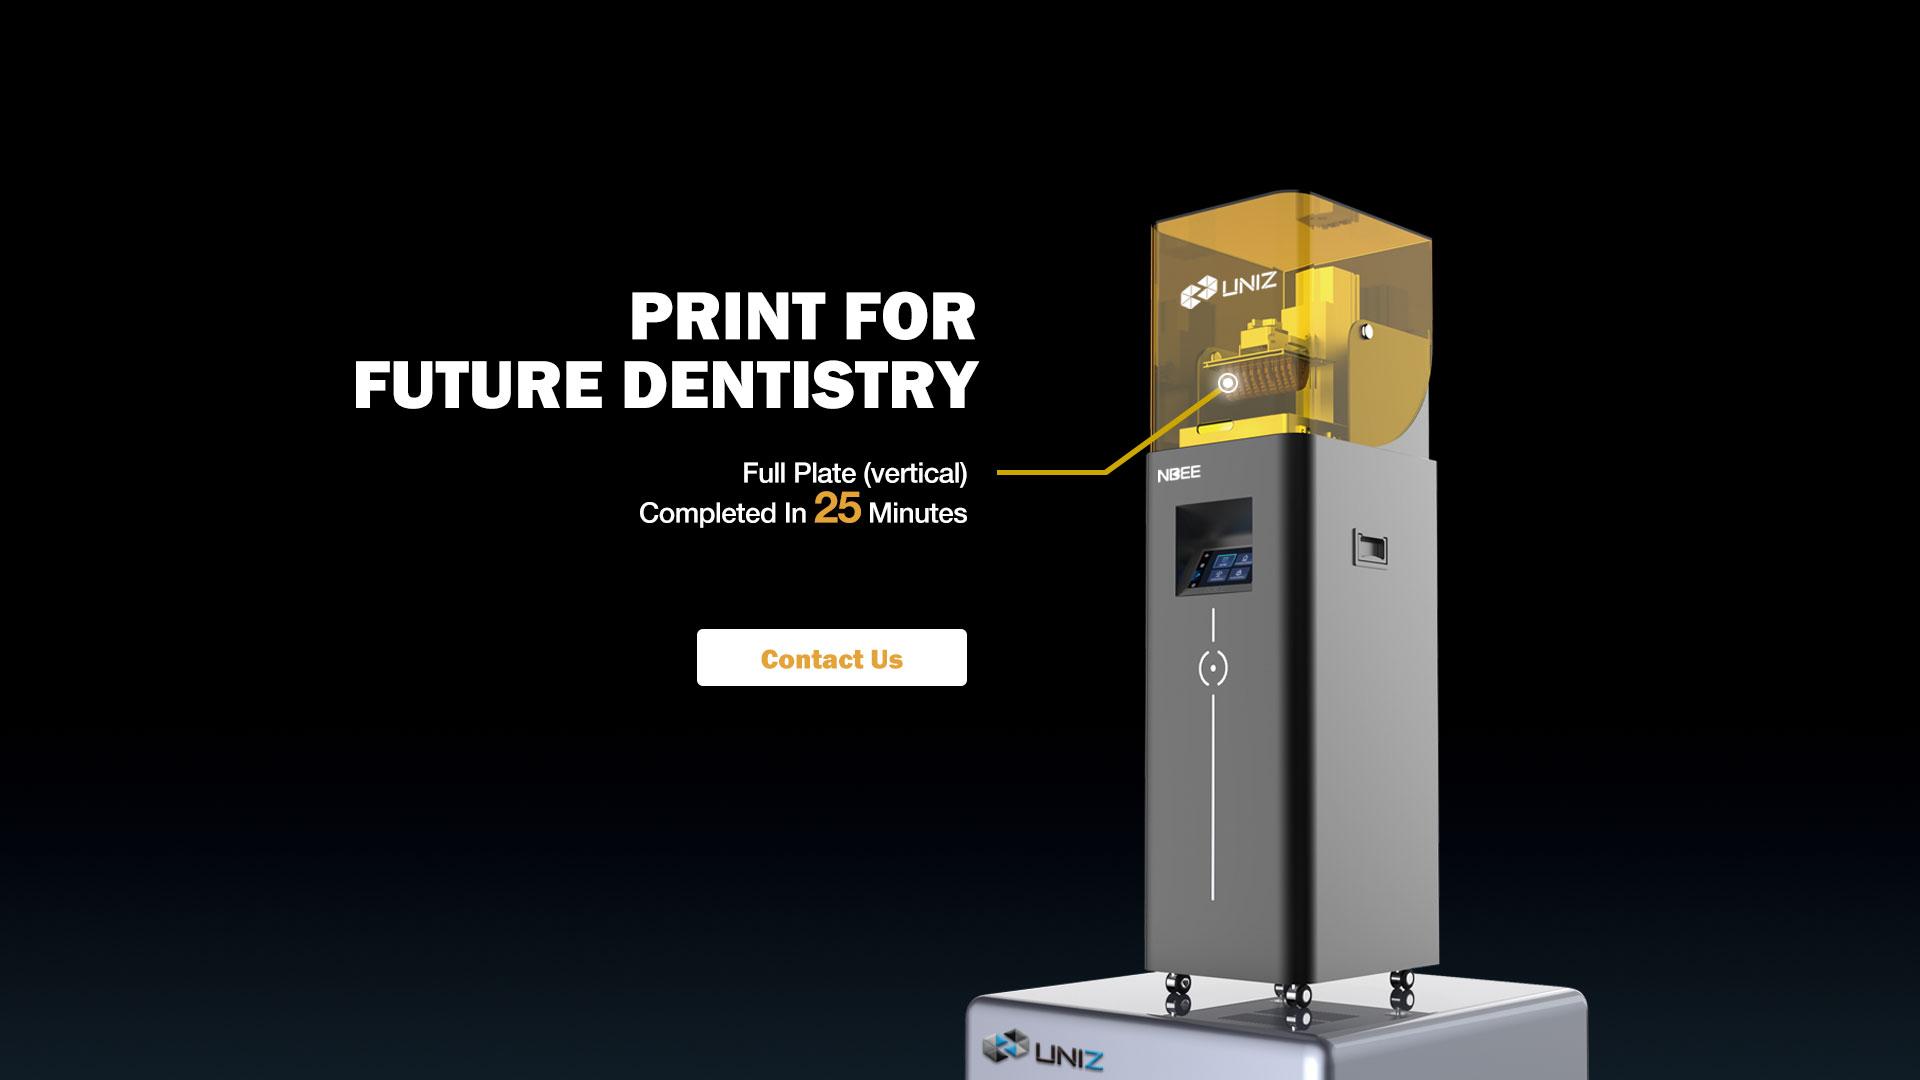 UNIZ NBEE DENTAL 3D Printer